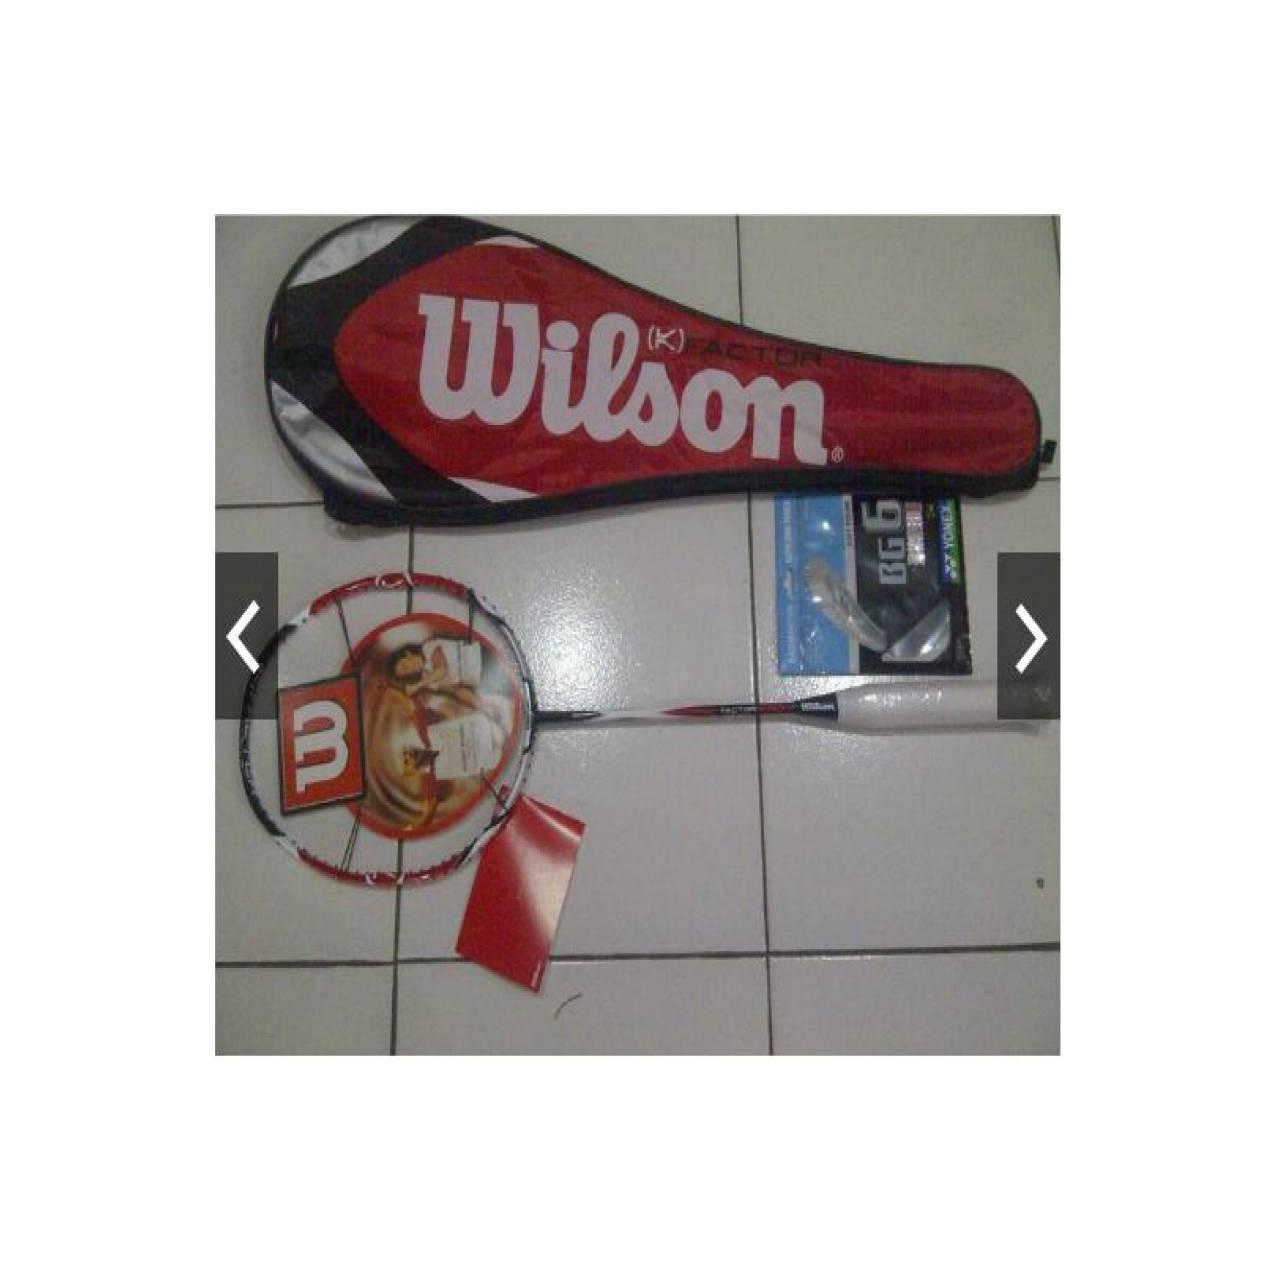 Raket badminton Wilson kfaktor merah limited edition